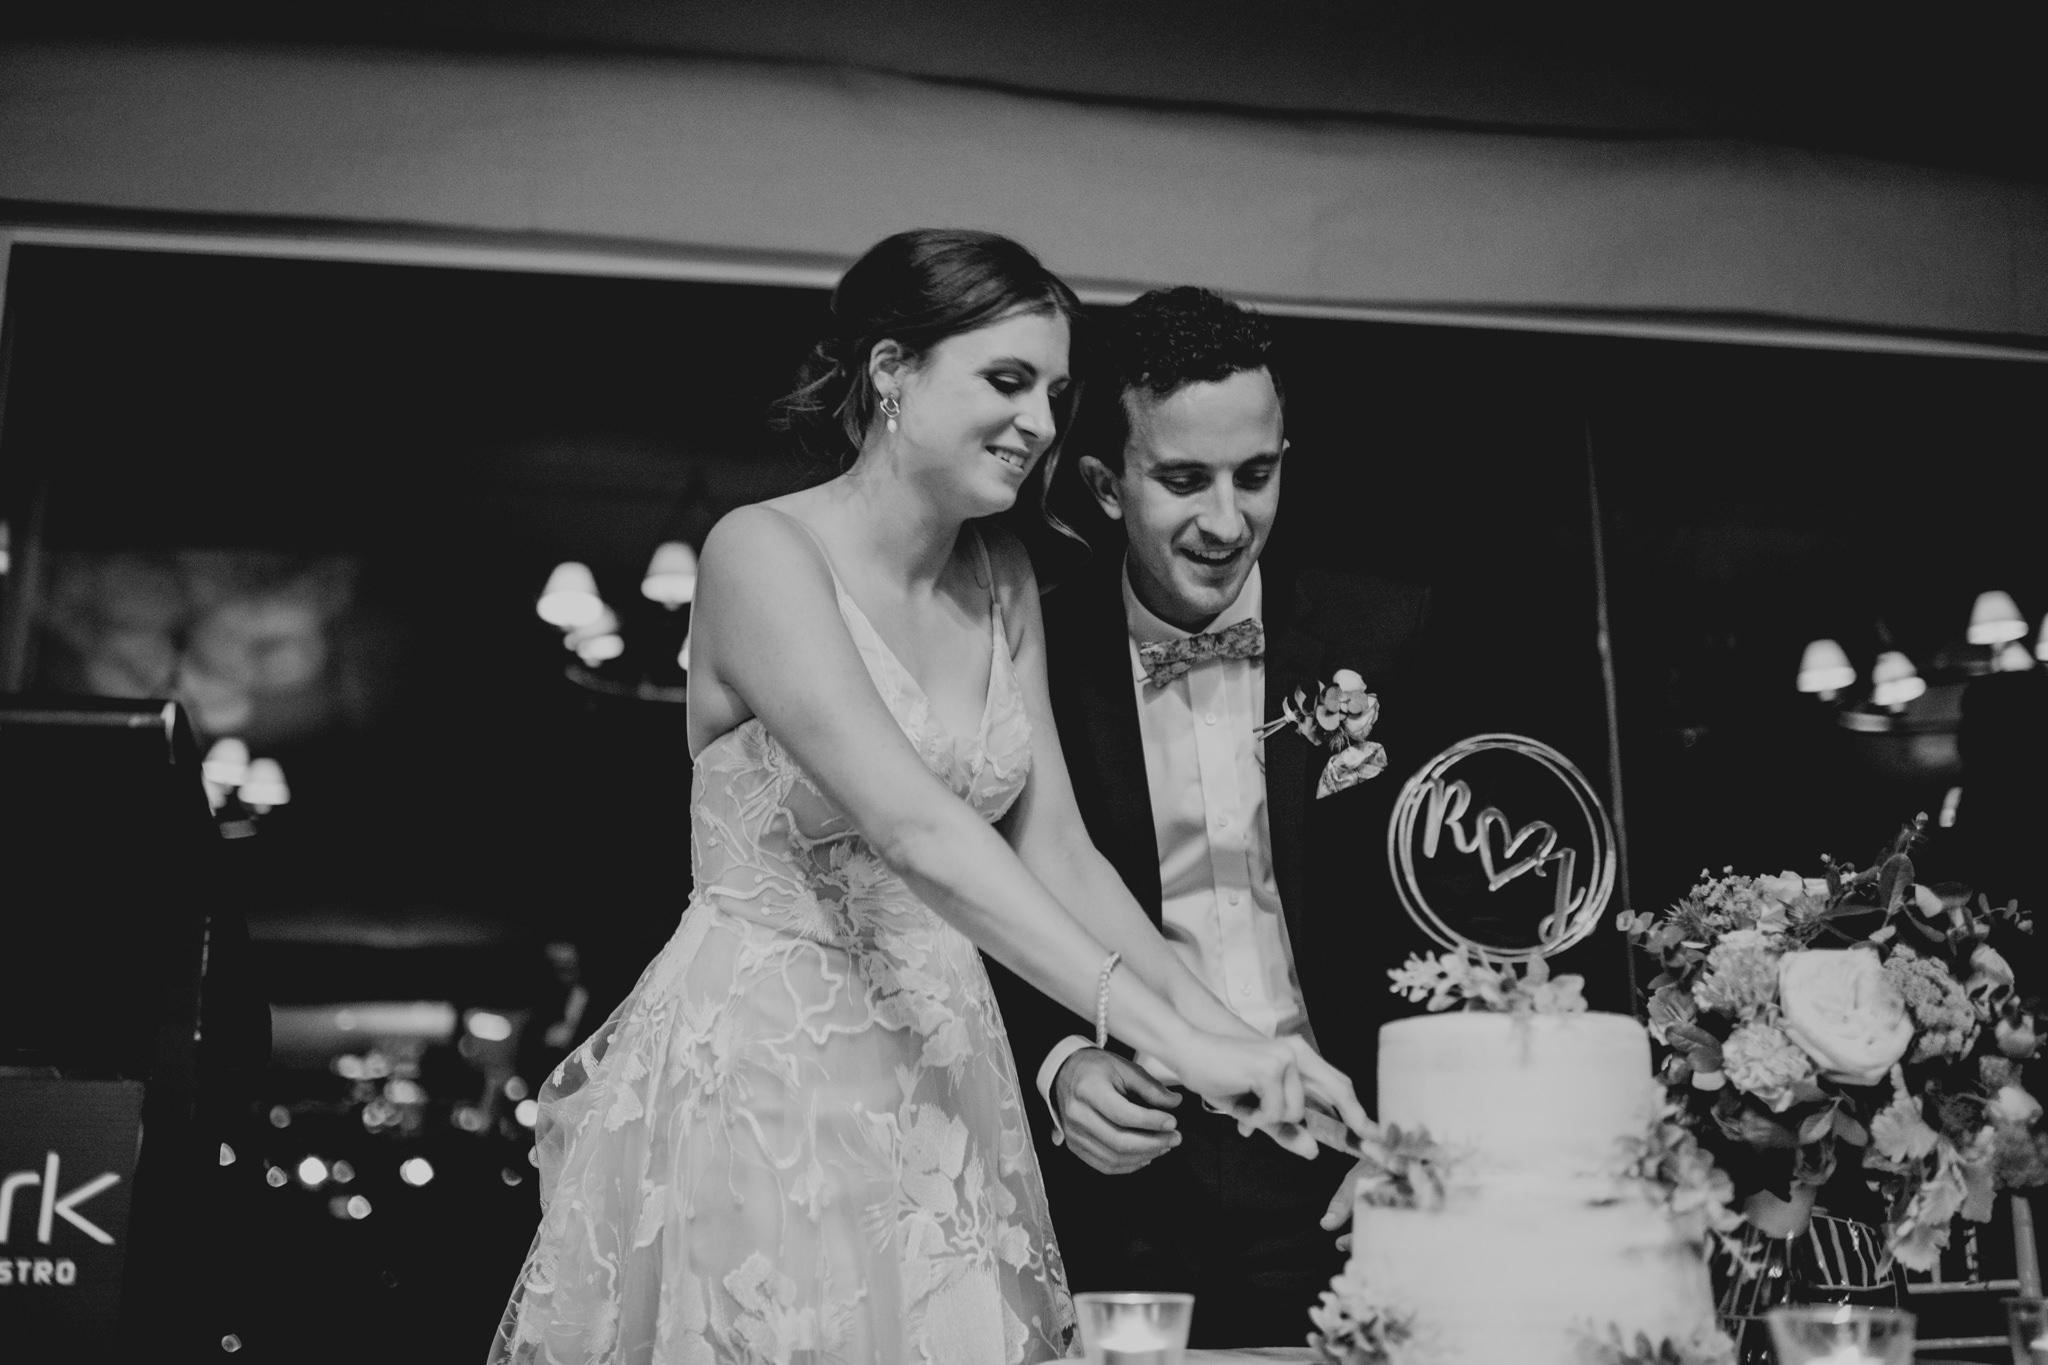 Bride and groom enthusiastically cut wedding cake